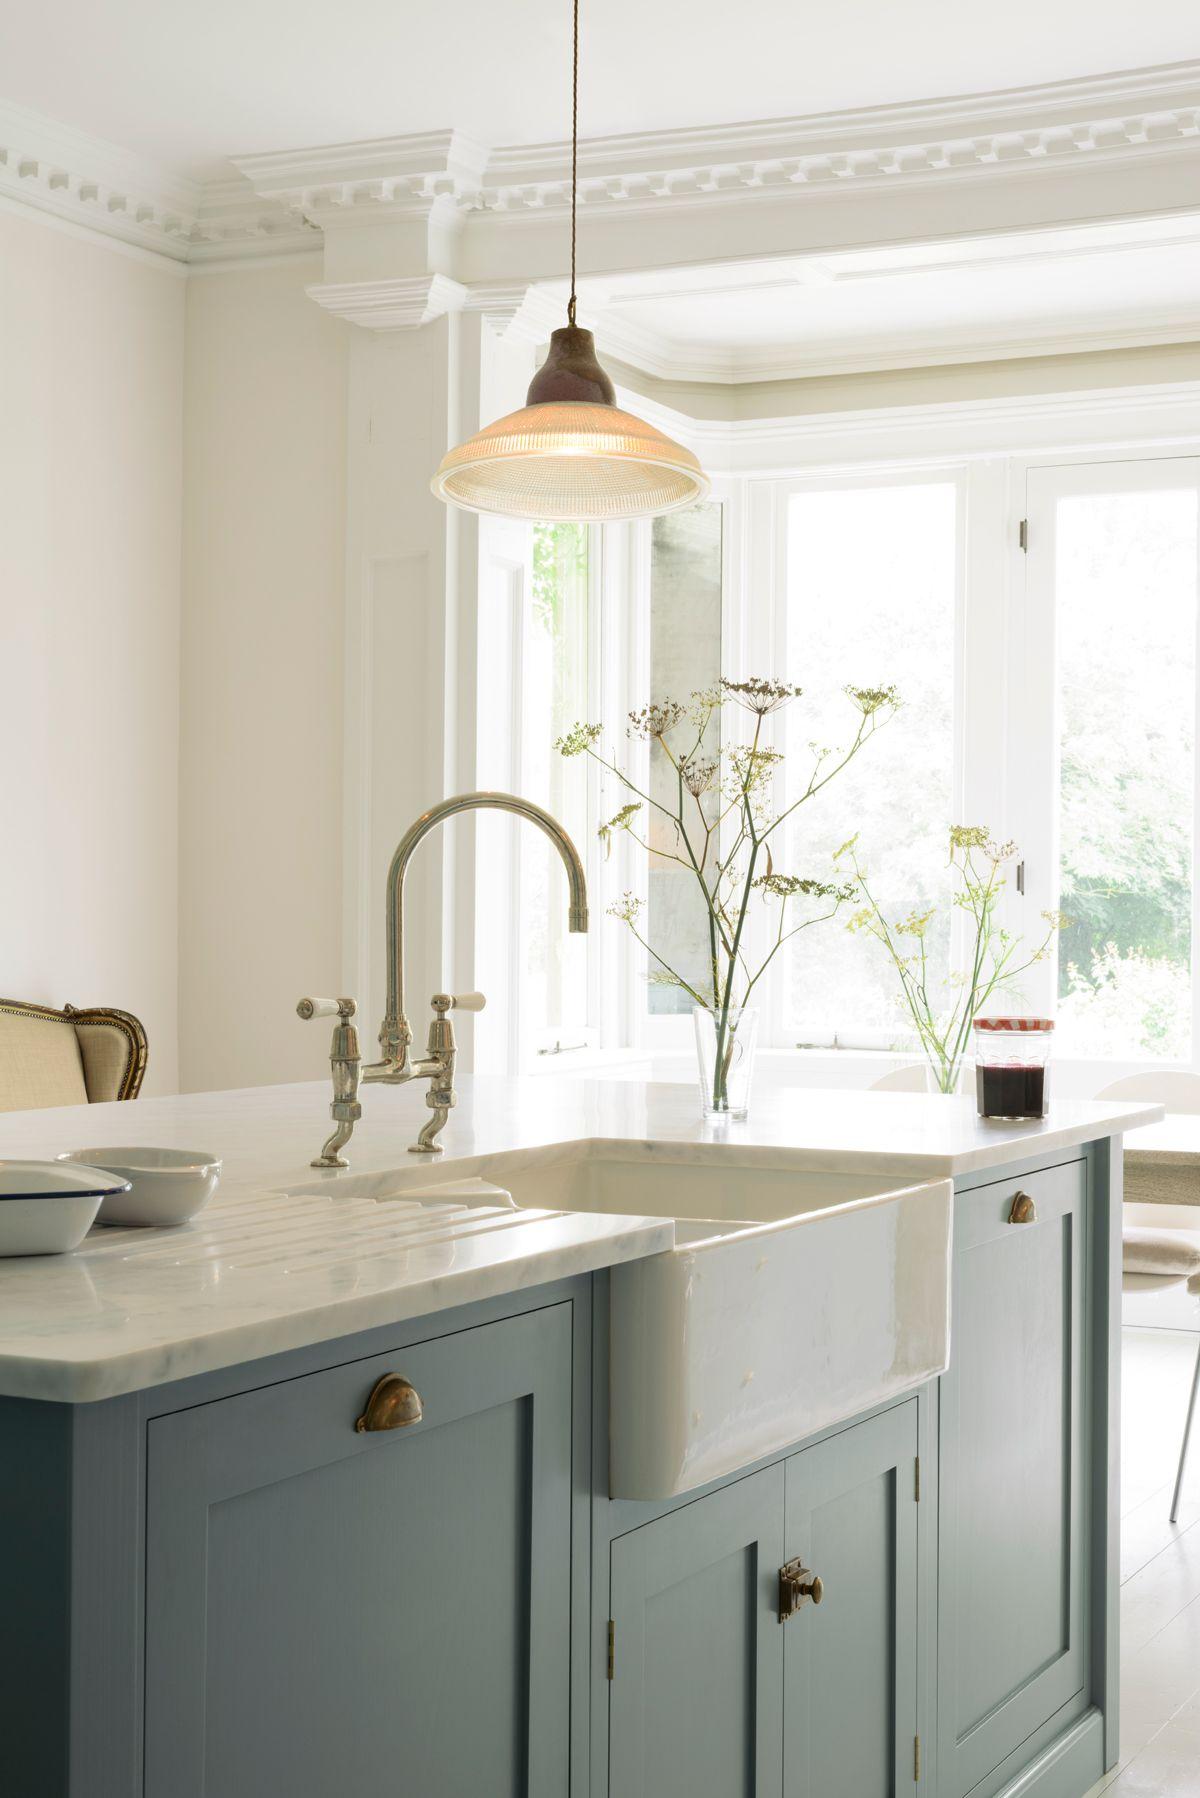 deVOL directory: The South Wing Kitchen | Devol kitchens, Kitchens ...